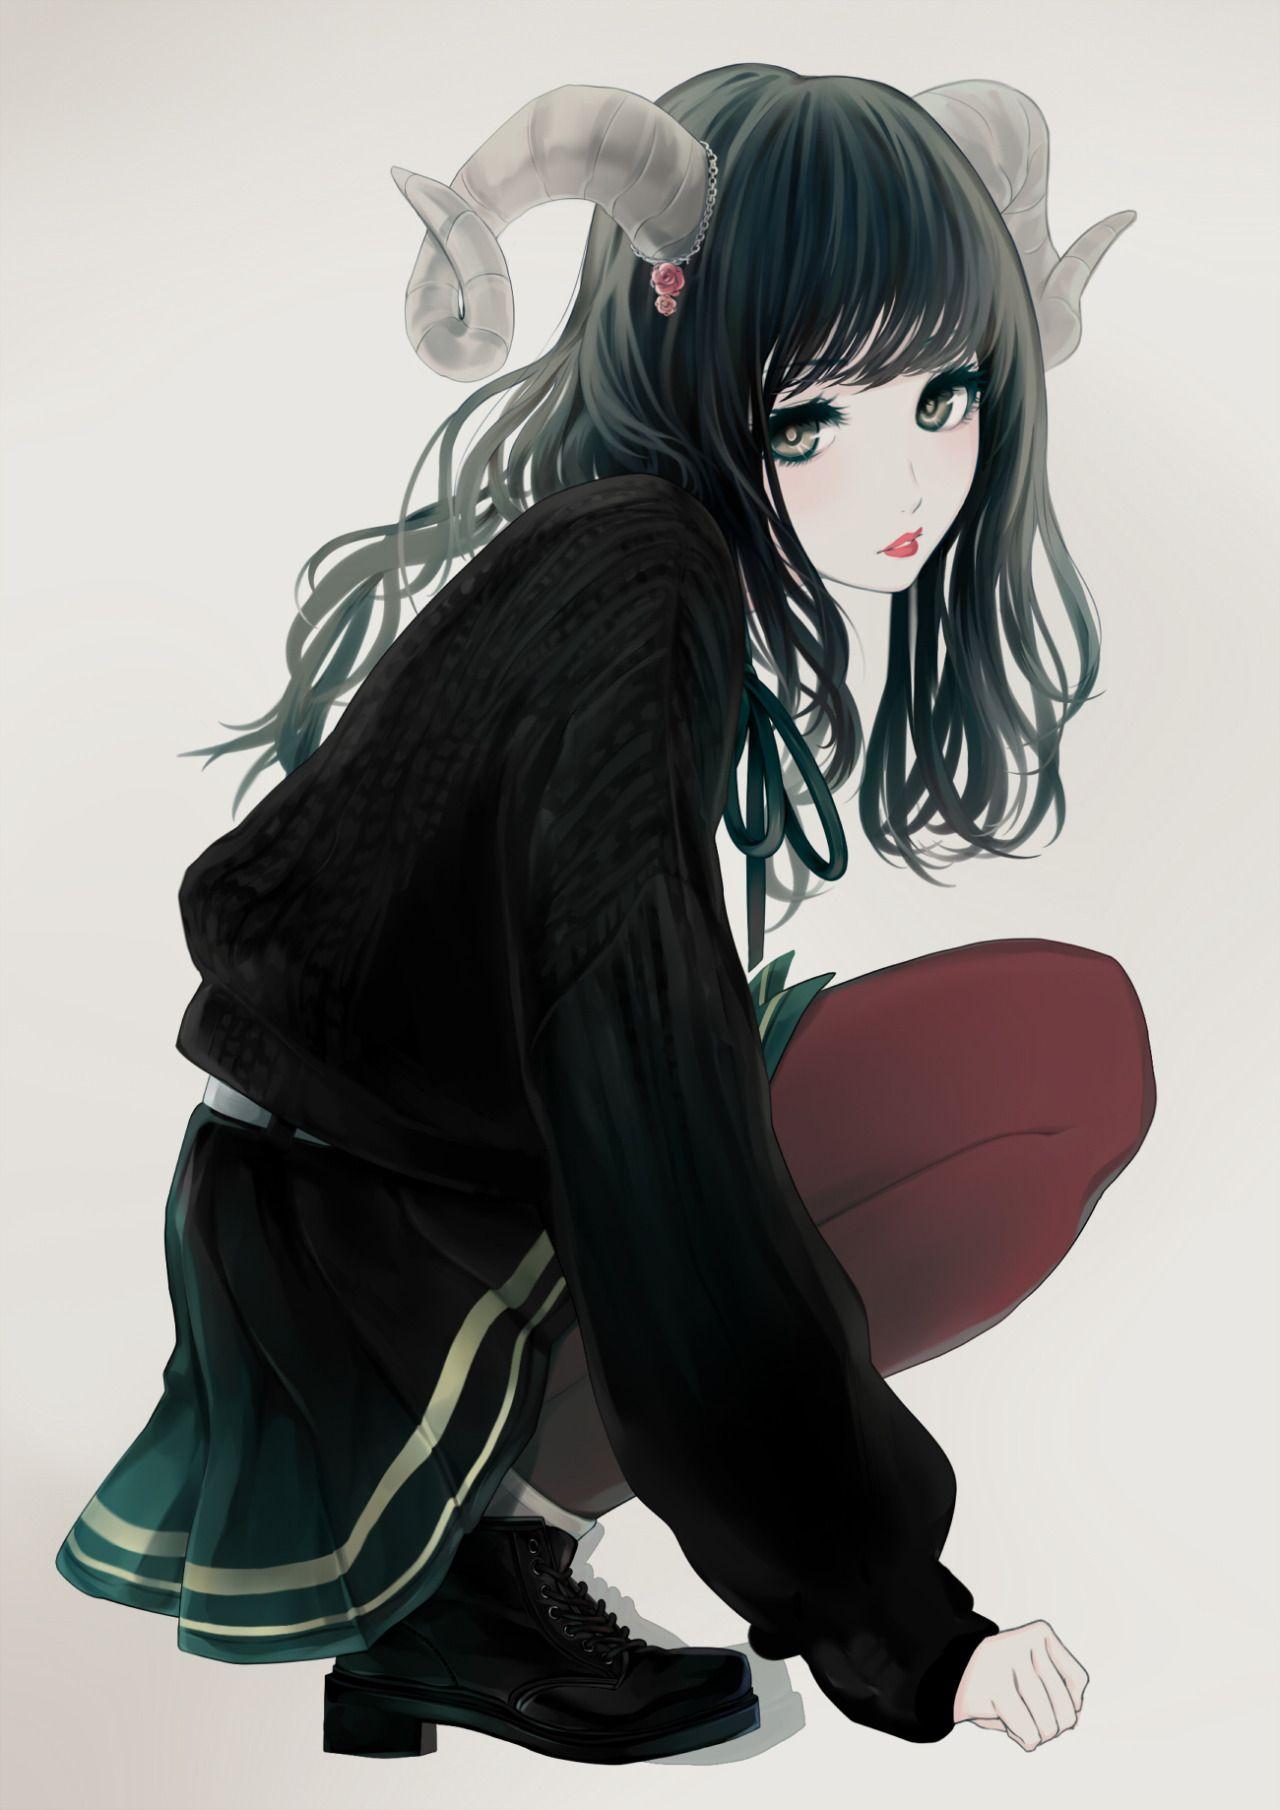 Anime girl tumblr